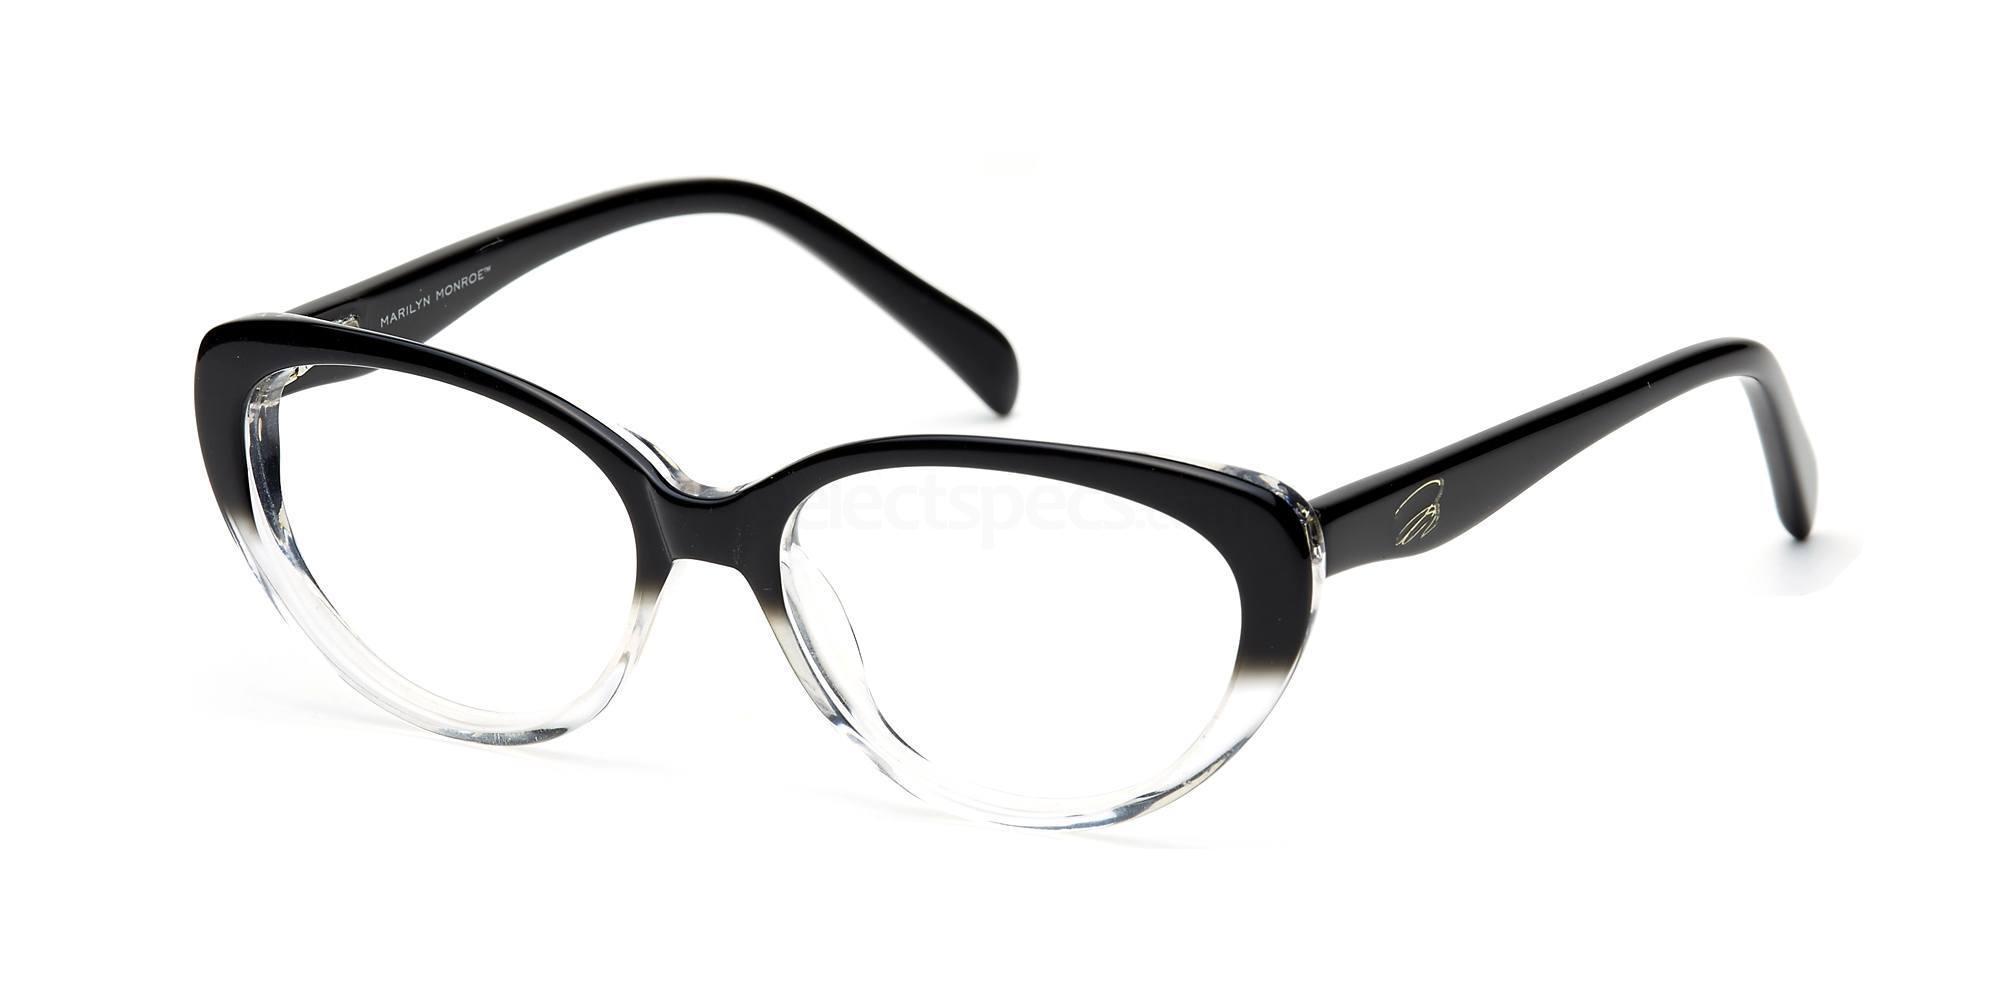 4474bea2f275 marilyn monroe mmo141 glasses free lenses   delivery omnioptics australia.  SELECTSPECS